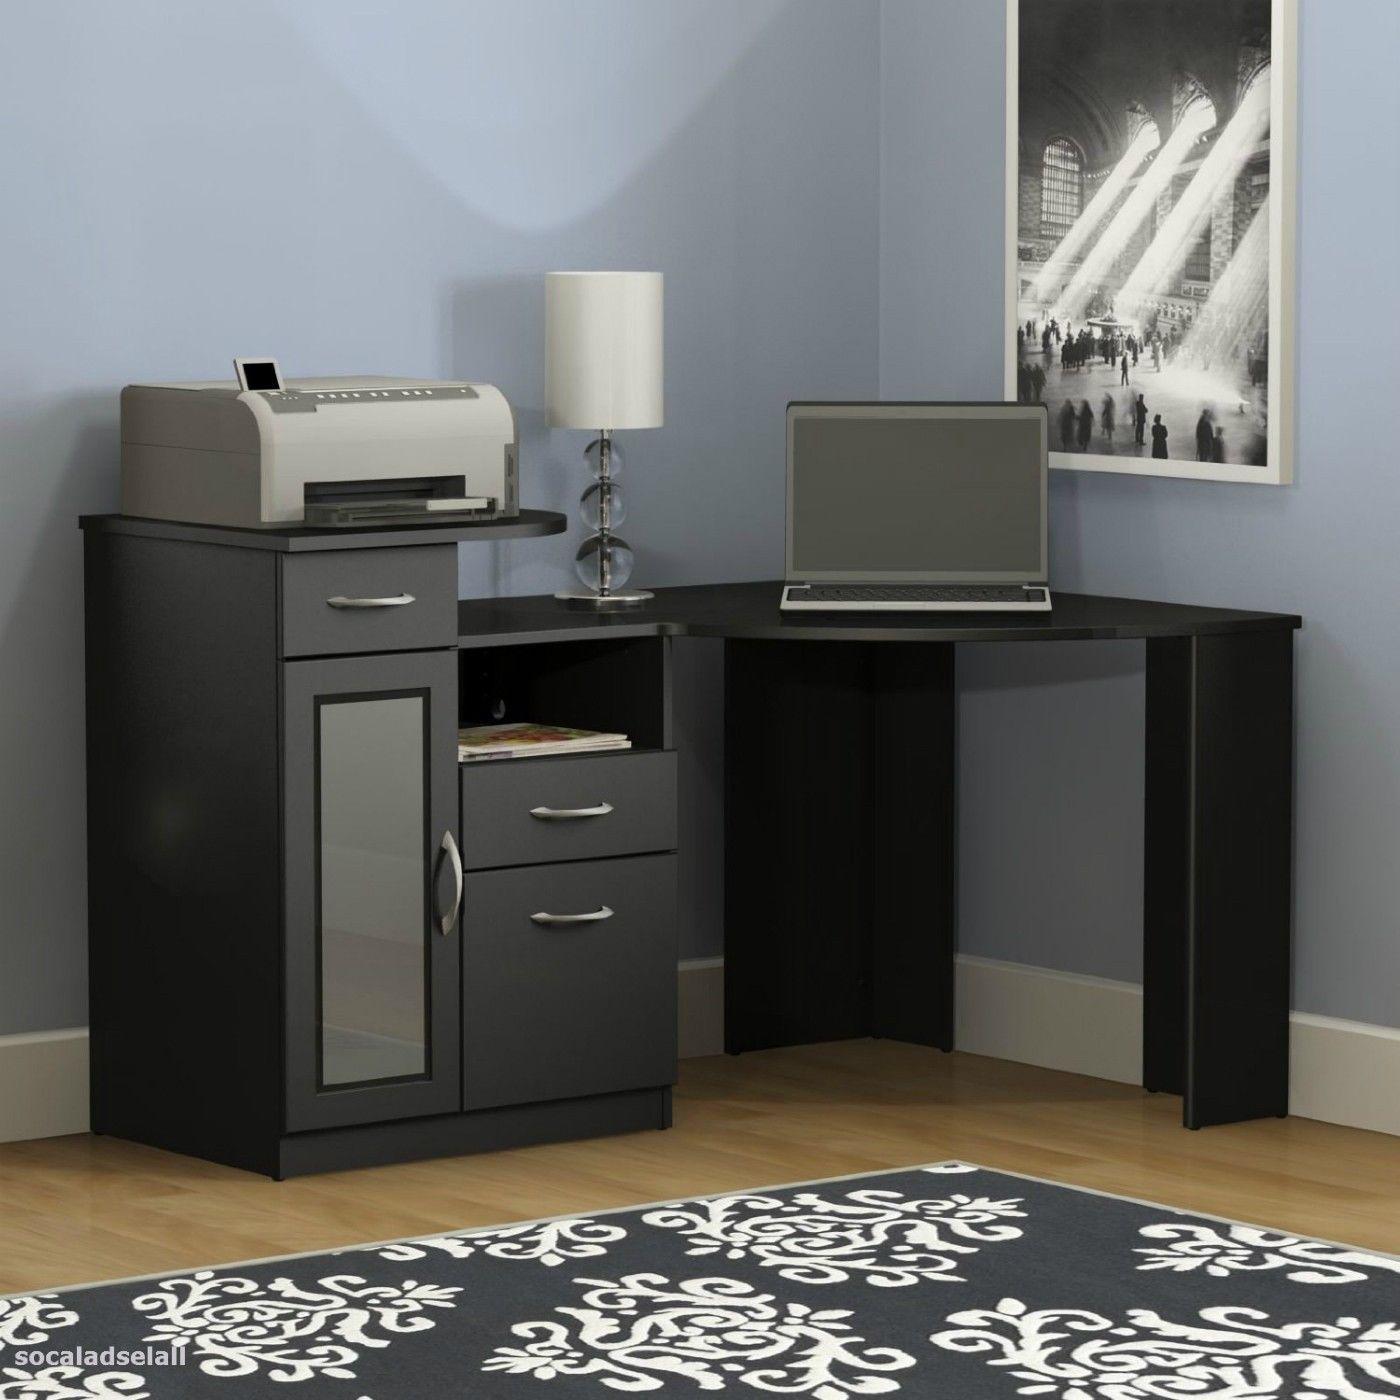 Black Corner Computer Desk With Hutch Office Storage Drawer File